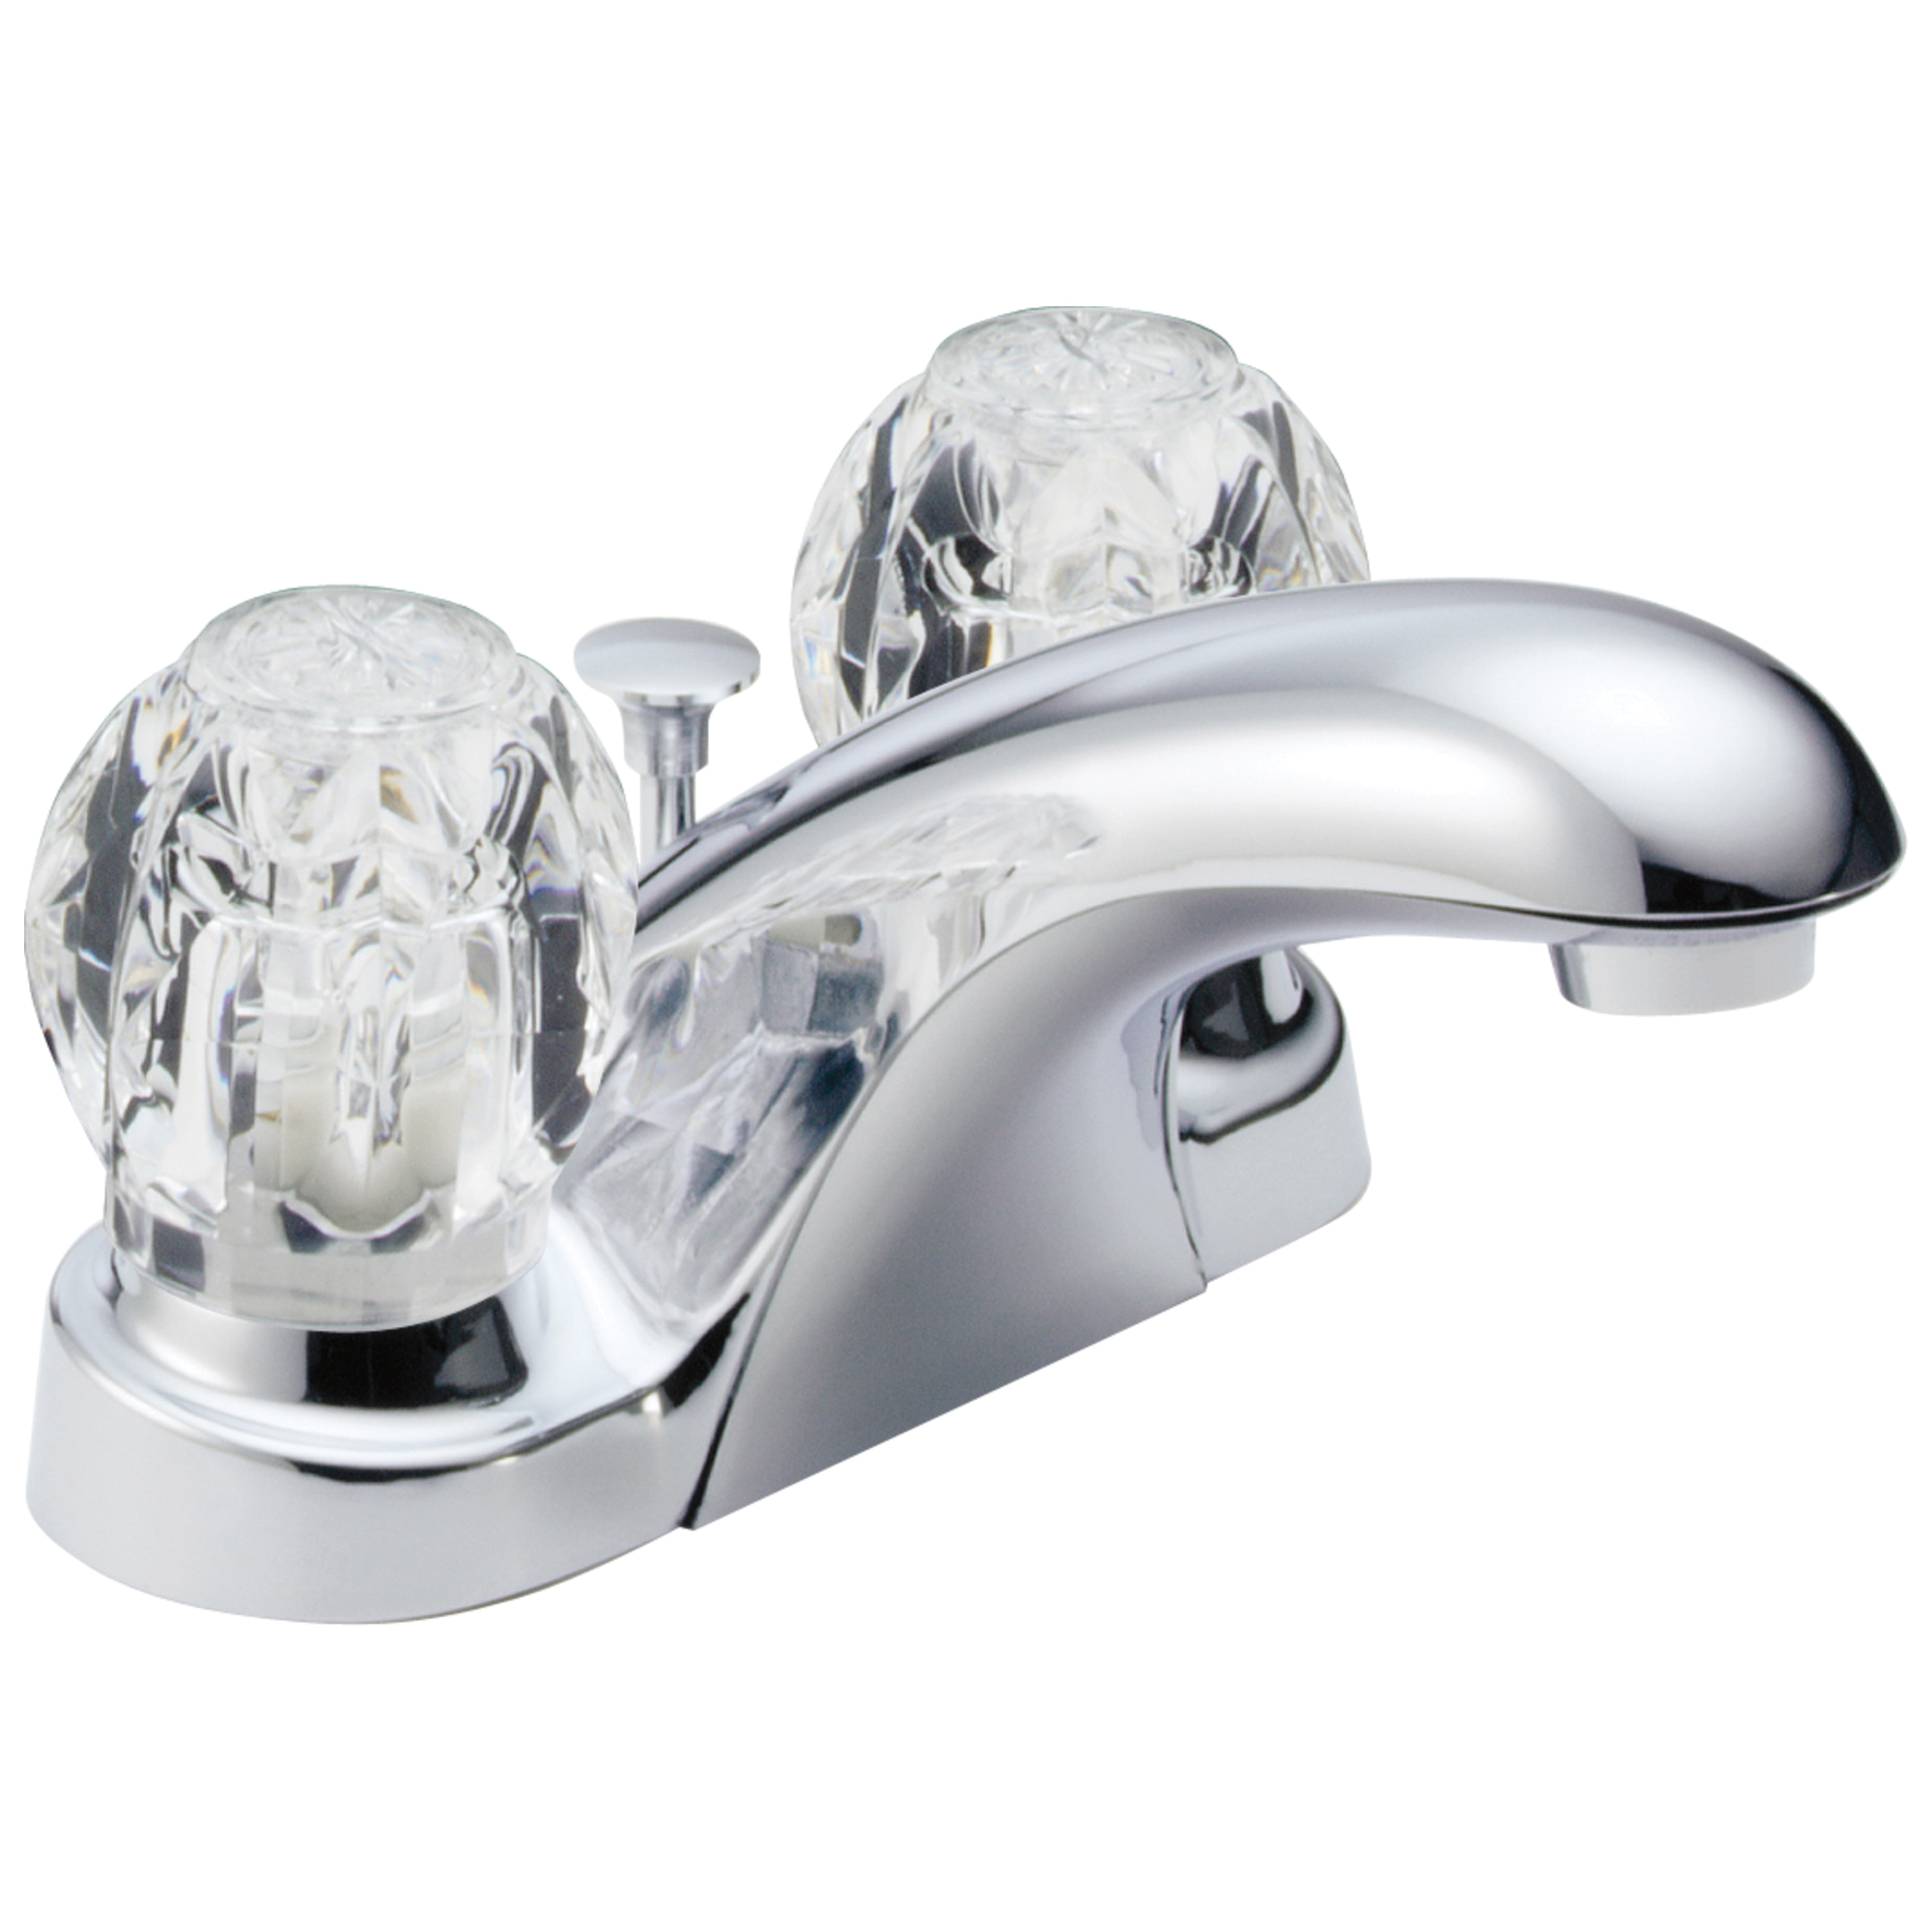 DELTA® B2512LF Centerset Lavatory Faucet, Foundations®, Chrome Plated, 2 Handles, Pop-Up Drain, 1.2 gpm